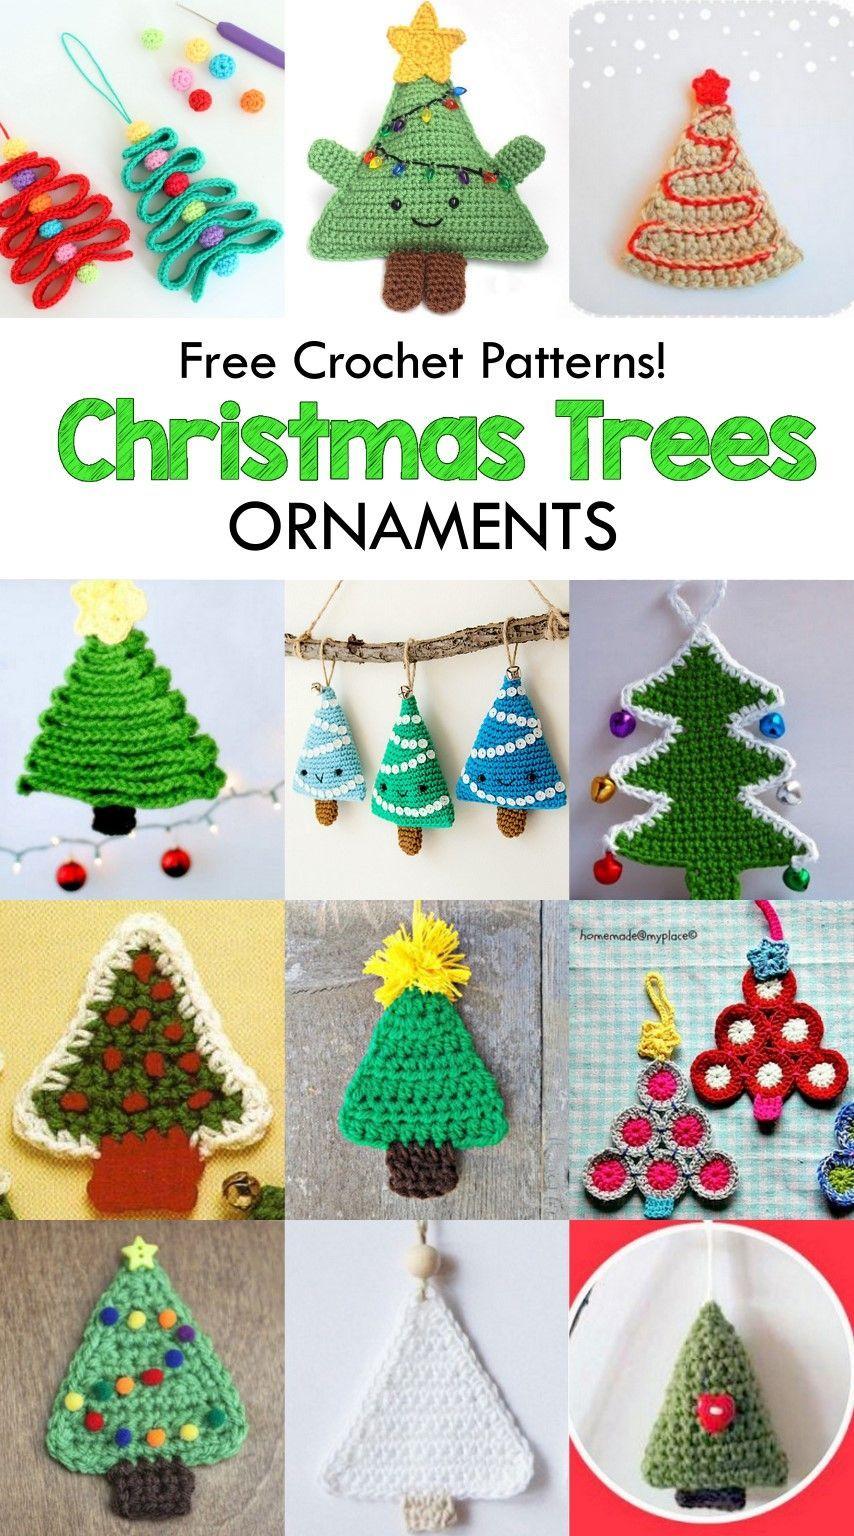 Amigurumi Crochet Christmas Tree Free Crochet Patterns Crochet Christmas Tree Amigurumi Christmas Crochet Patterns Crochet Xmas Crochet Christmas Decorations